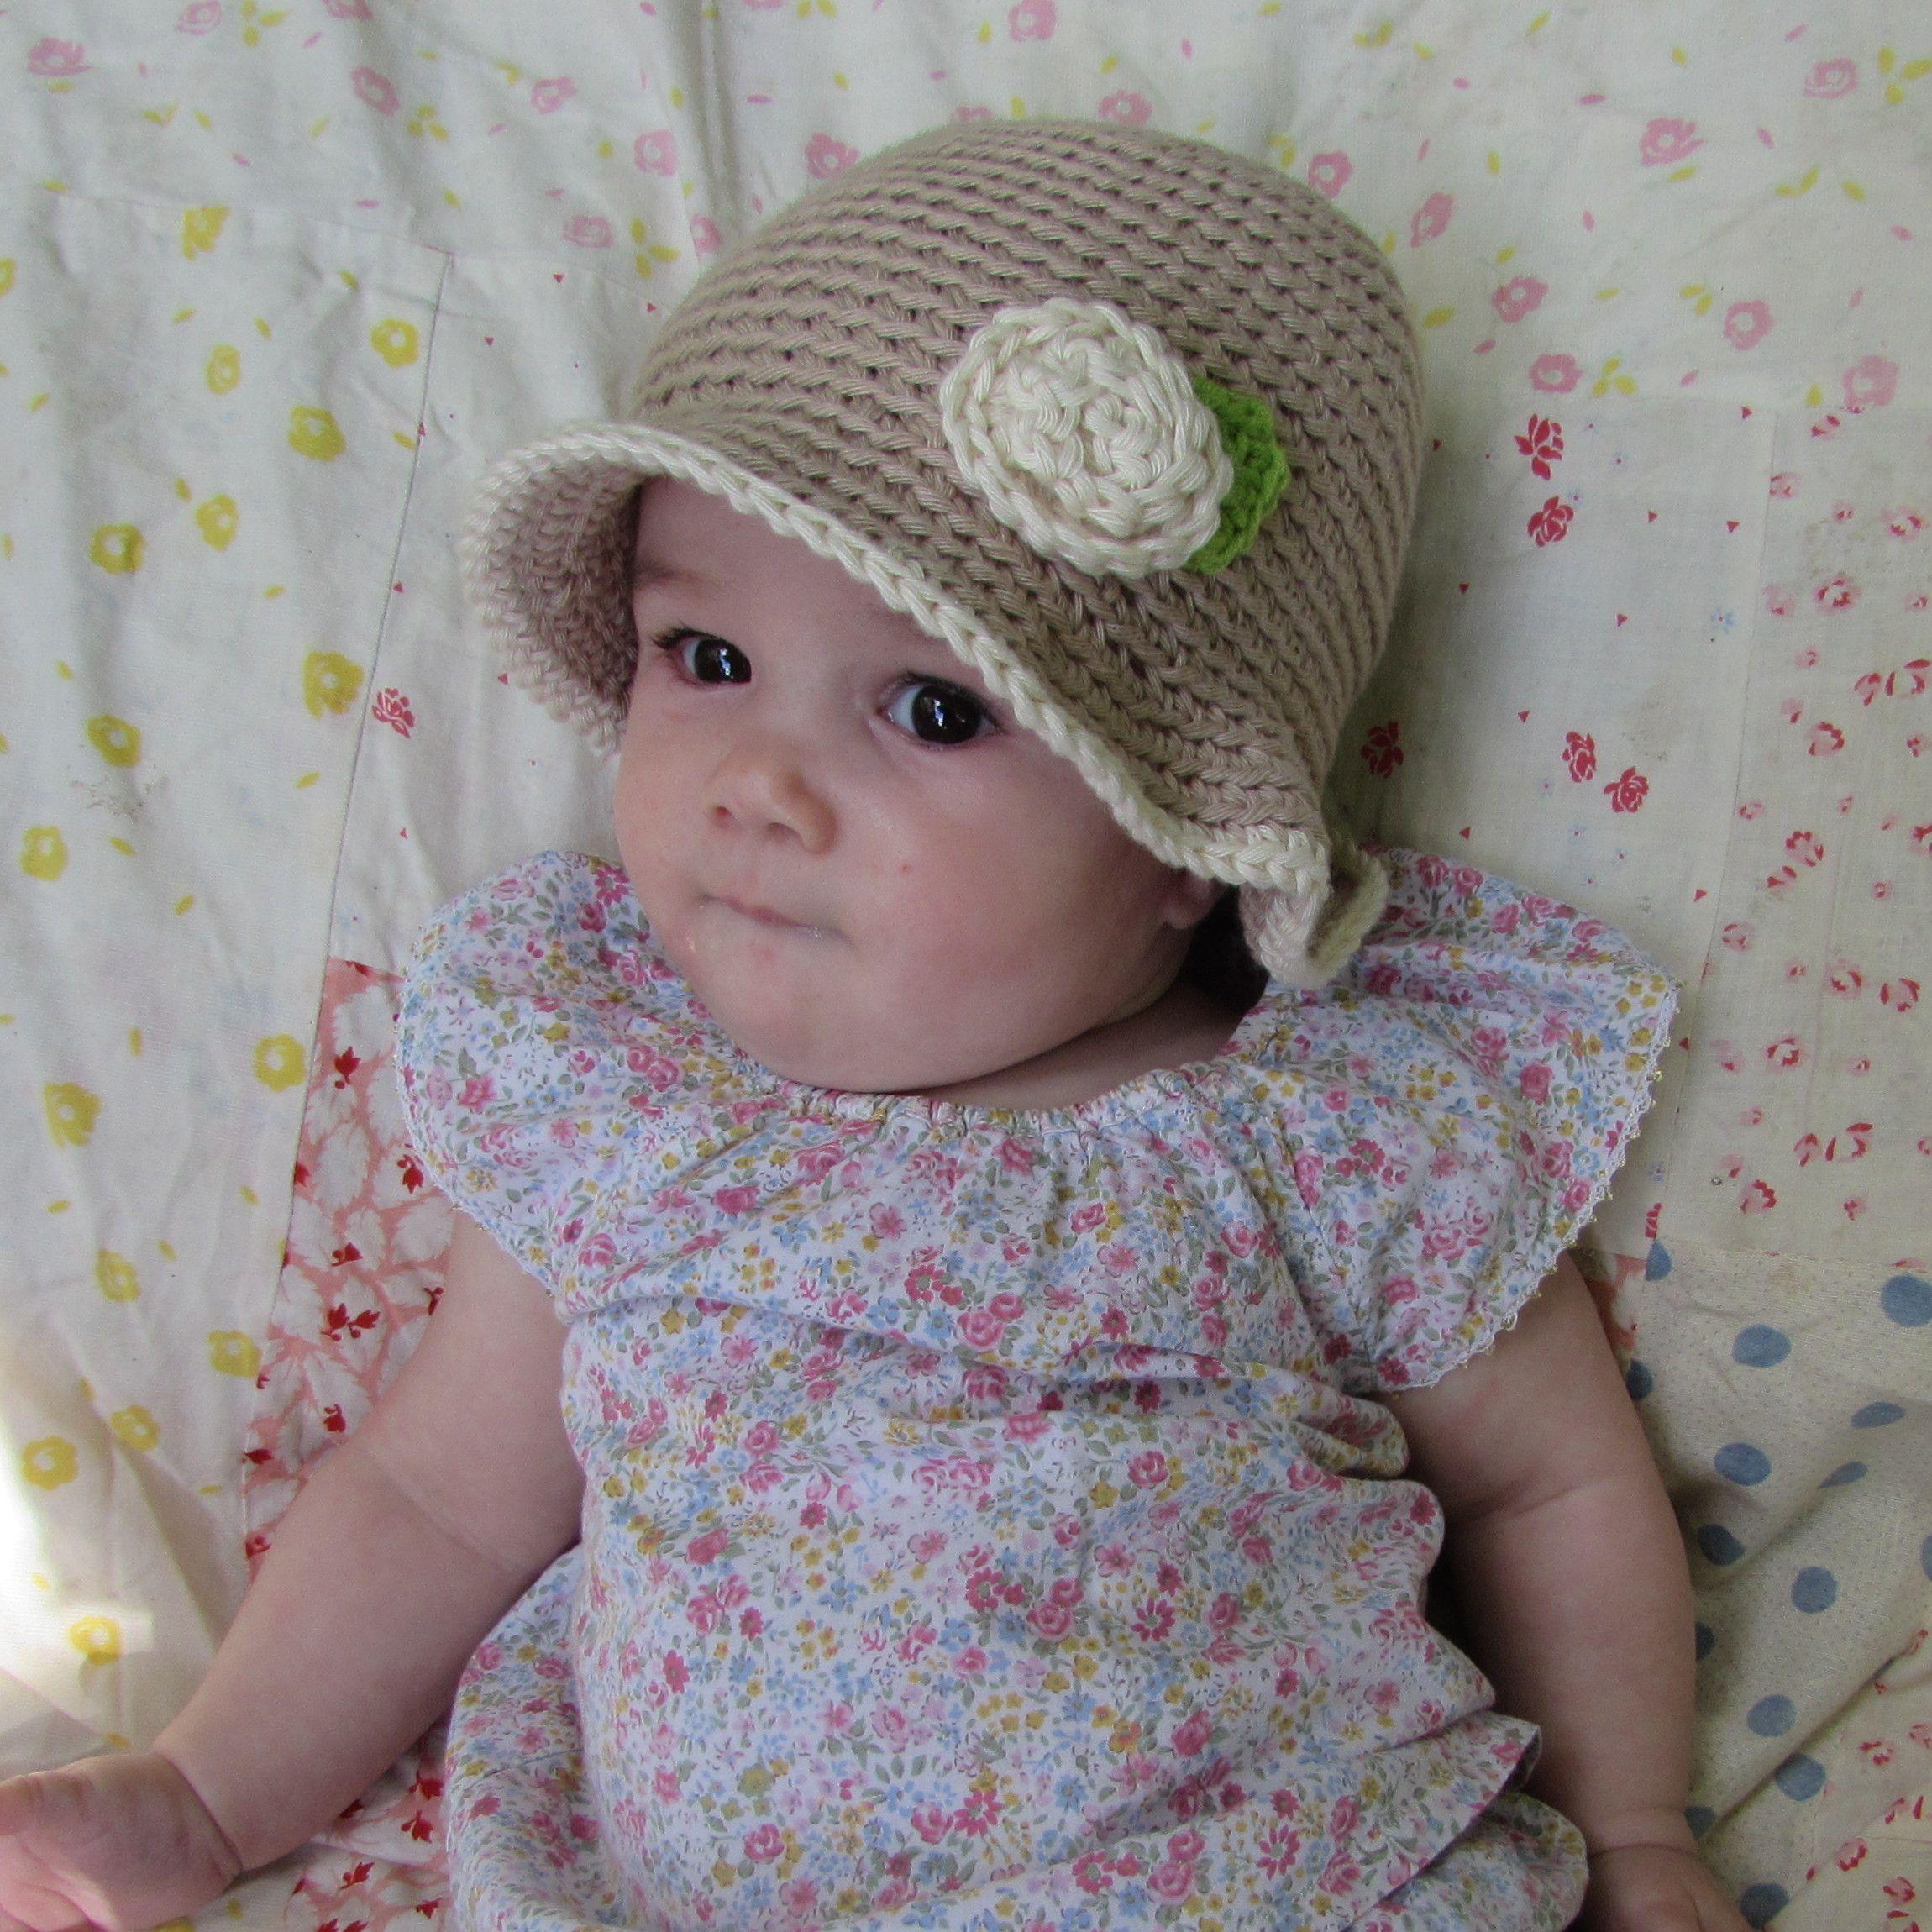 b26482c64086d Gorro bebé de verano beige con flor en algodón de 5 a 12 meses ...